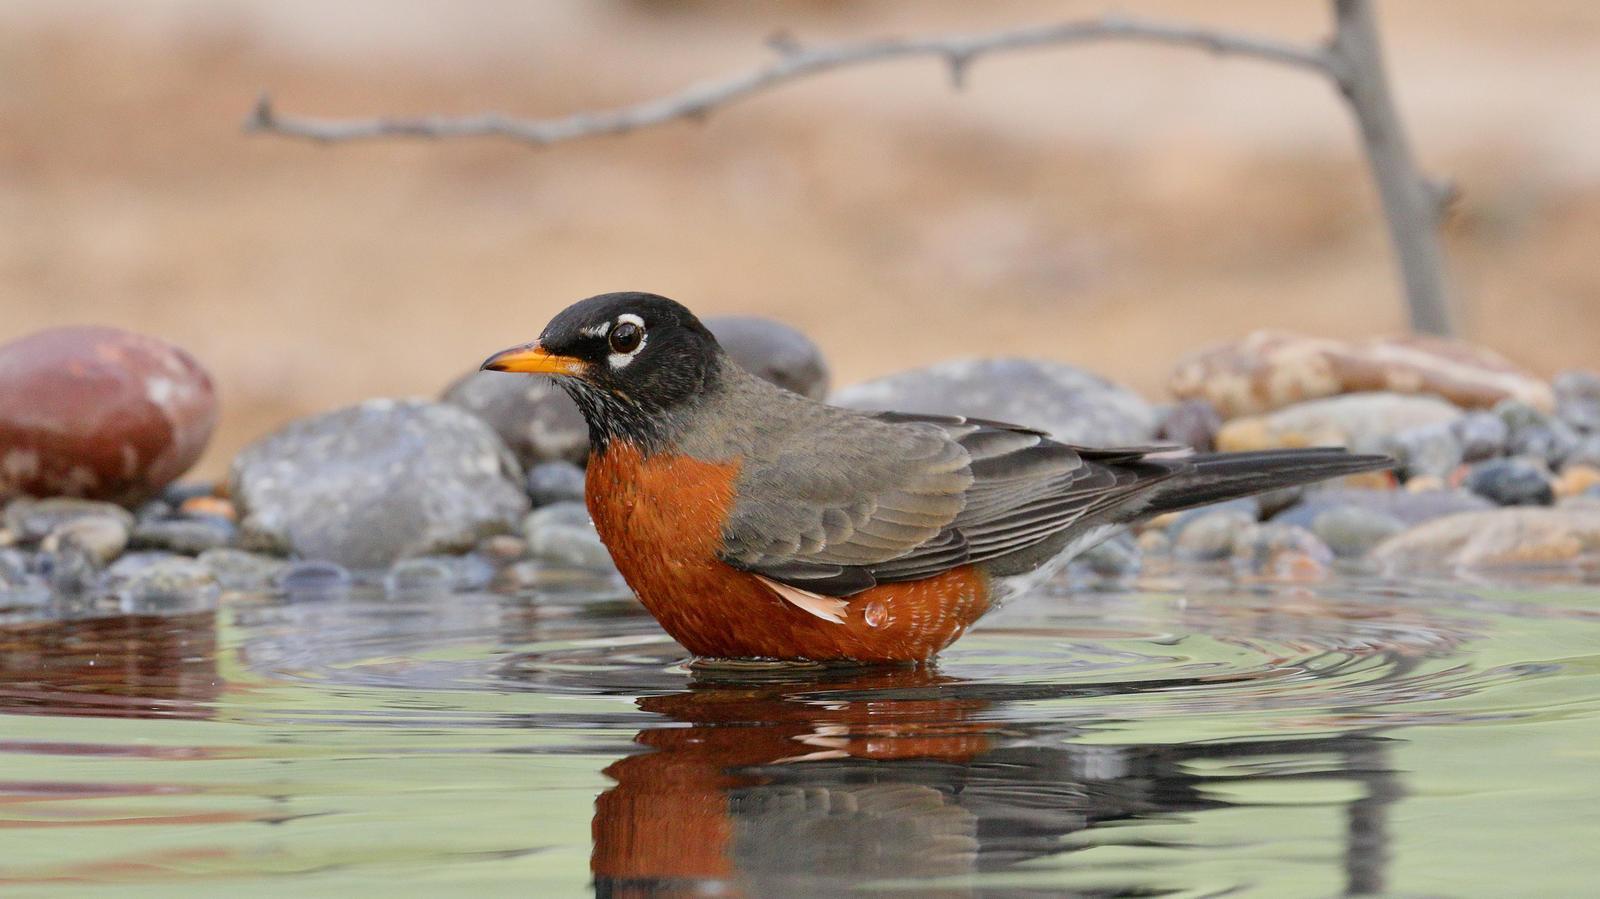 American Robin Photo by Bob Walker